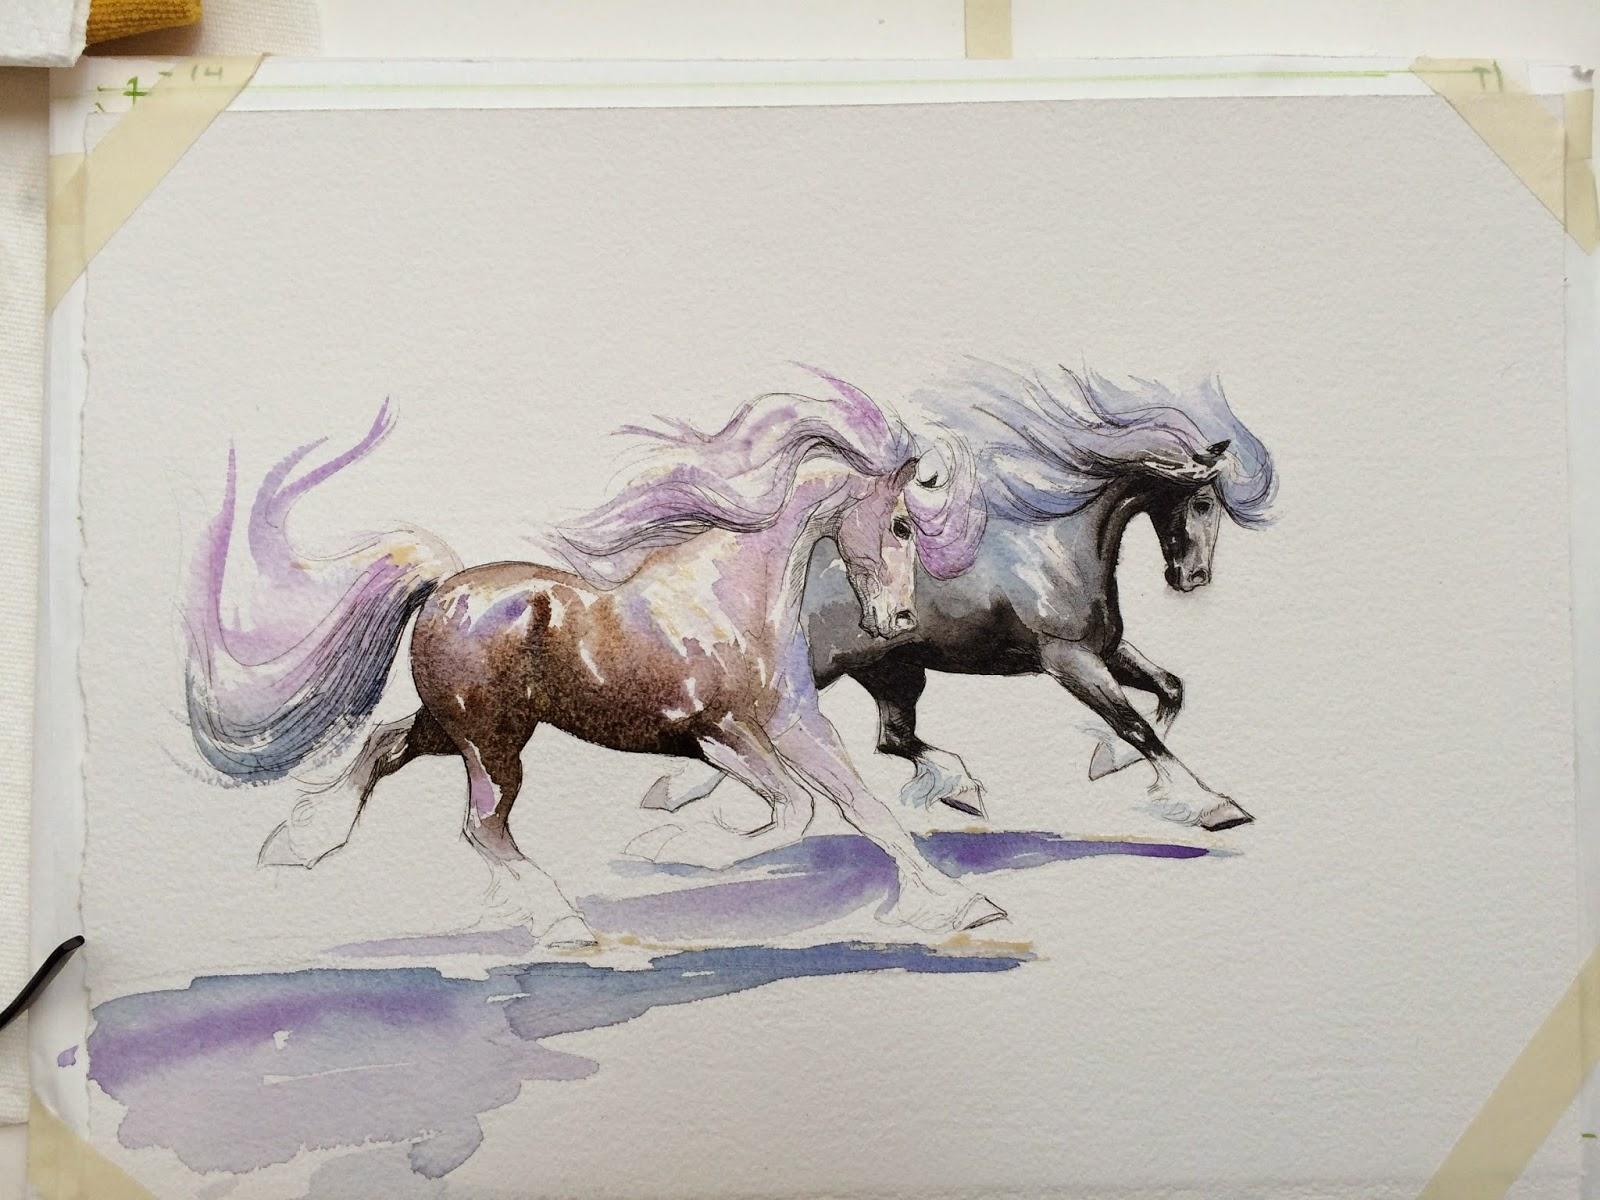 Cool   Wallpaper Horse Watercolor - TwoC%2BWC%2BhorsesProcess07  HD_85837.jpg